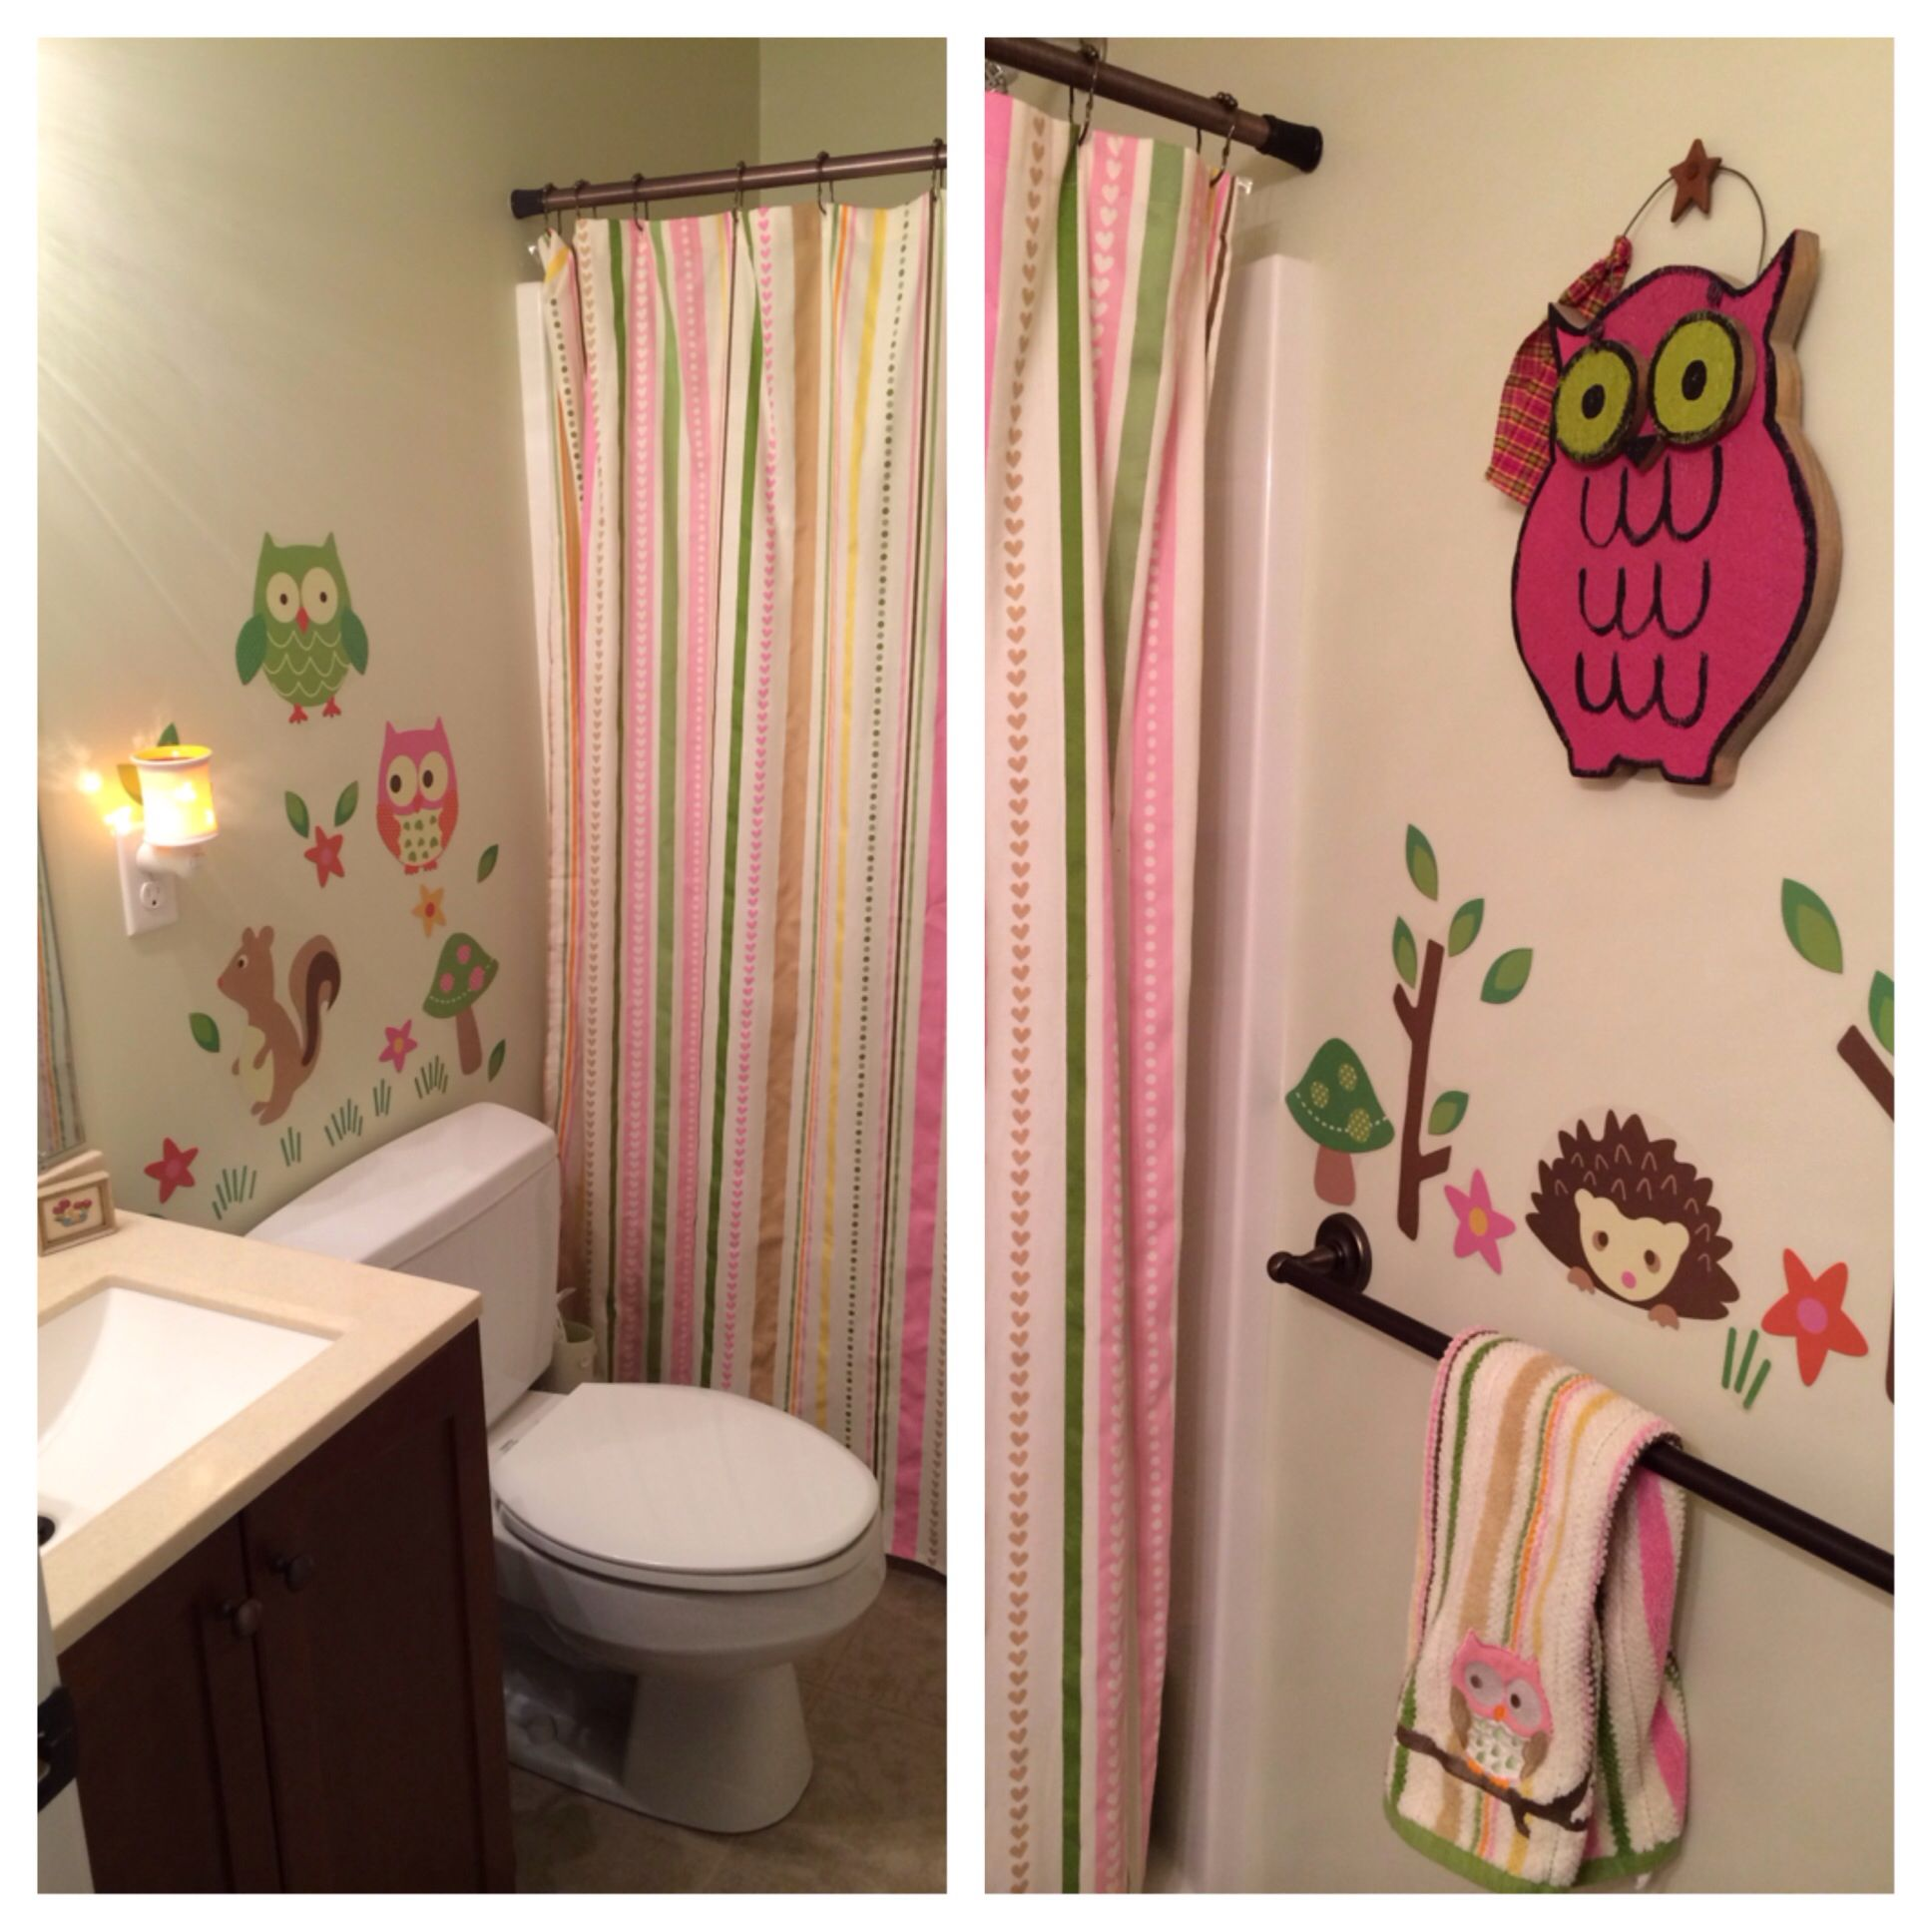 Our Owl Bathroom Set From Target Bathroom Decor Owl Bathroom Decor Owl Bathroom Owl bathroom decor set